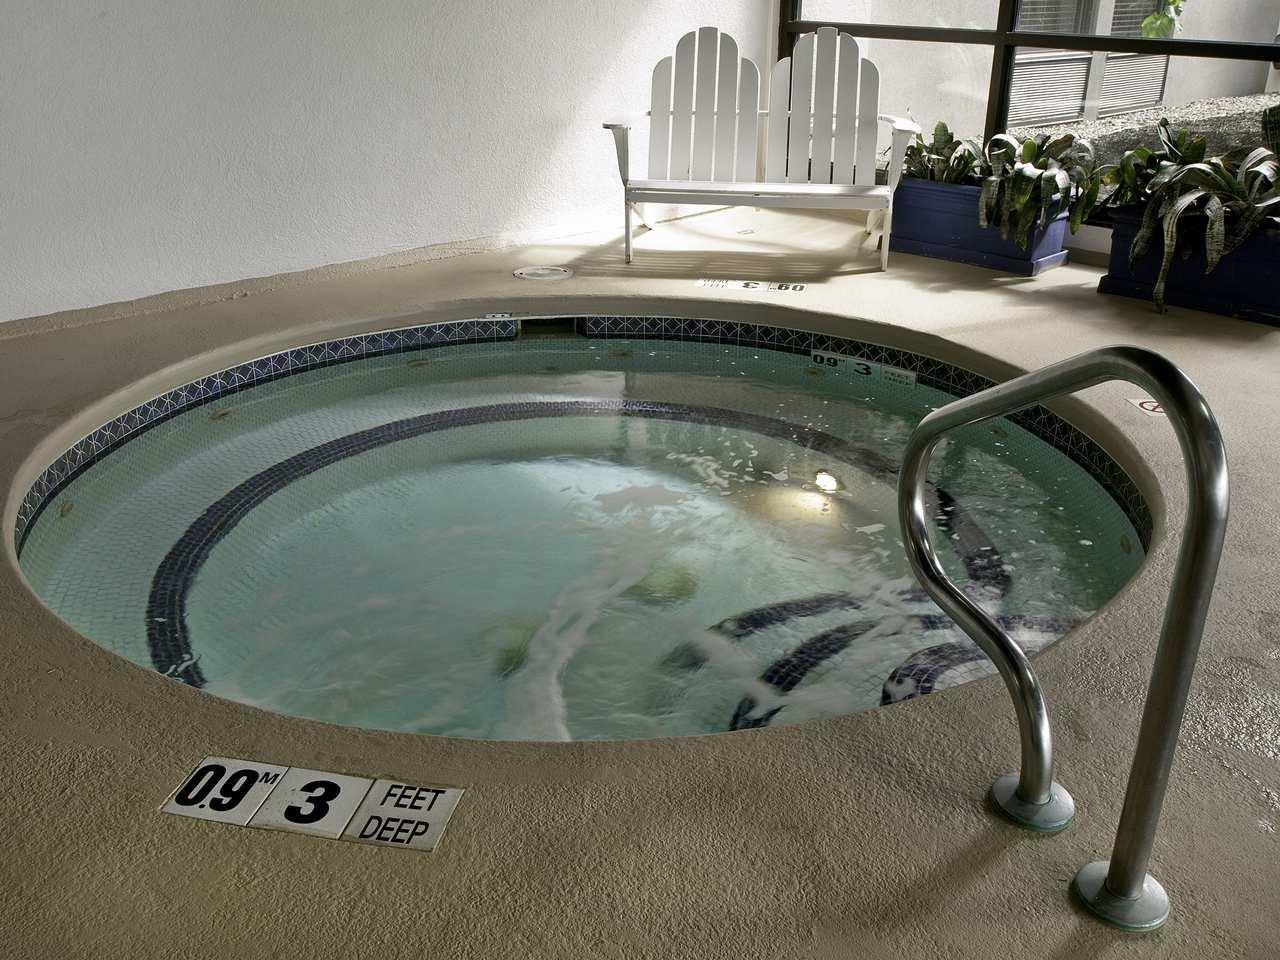 DoubleTree by Hilton Hotel Buffalo - Amherst image 3